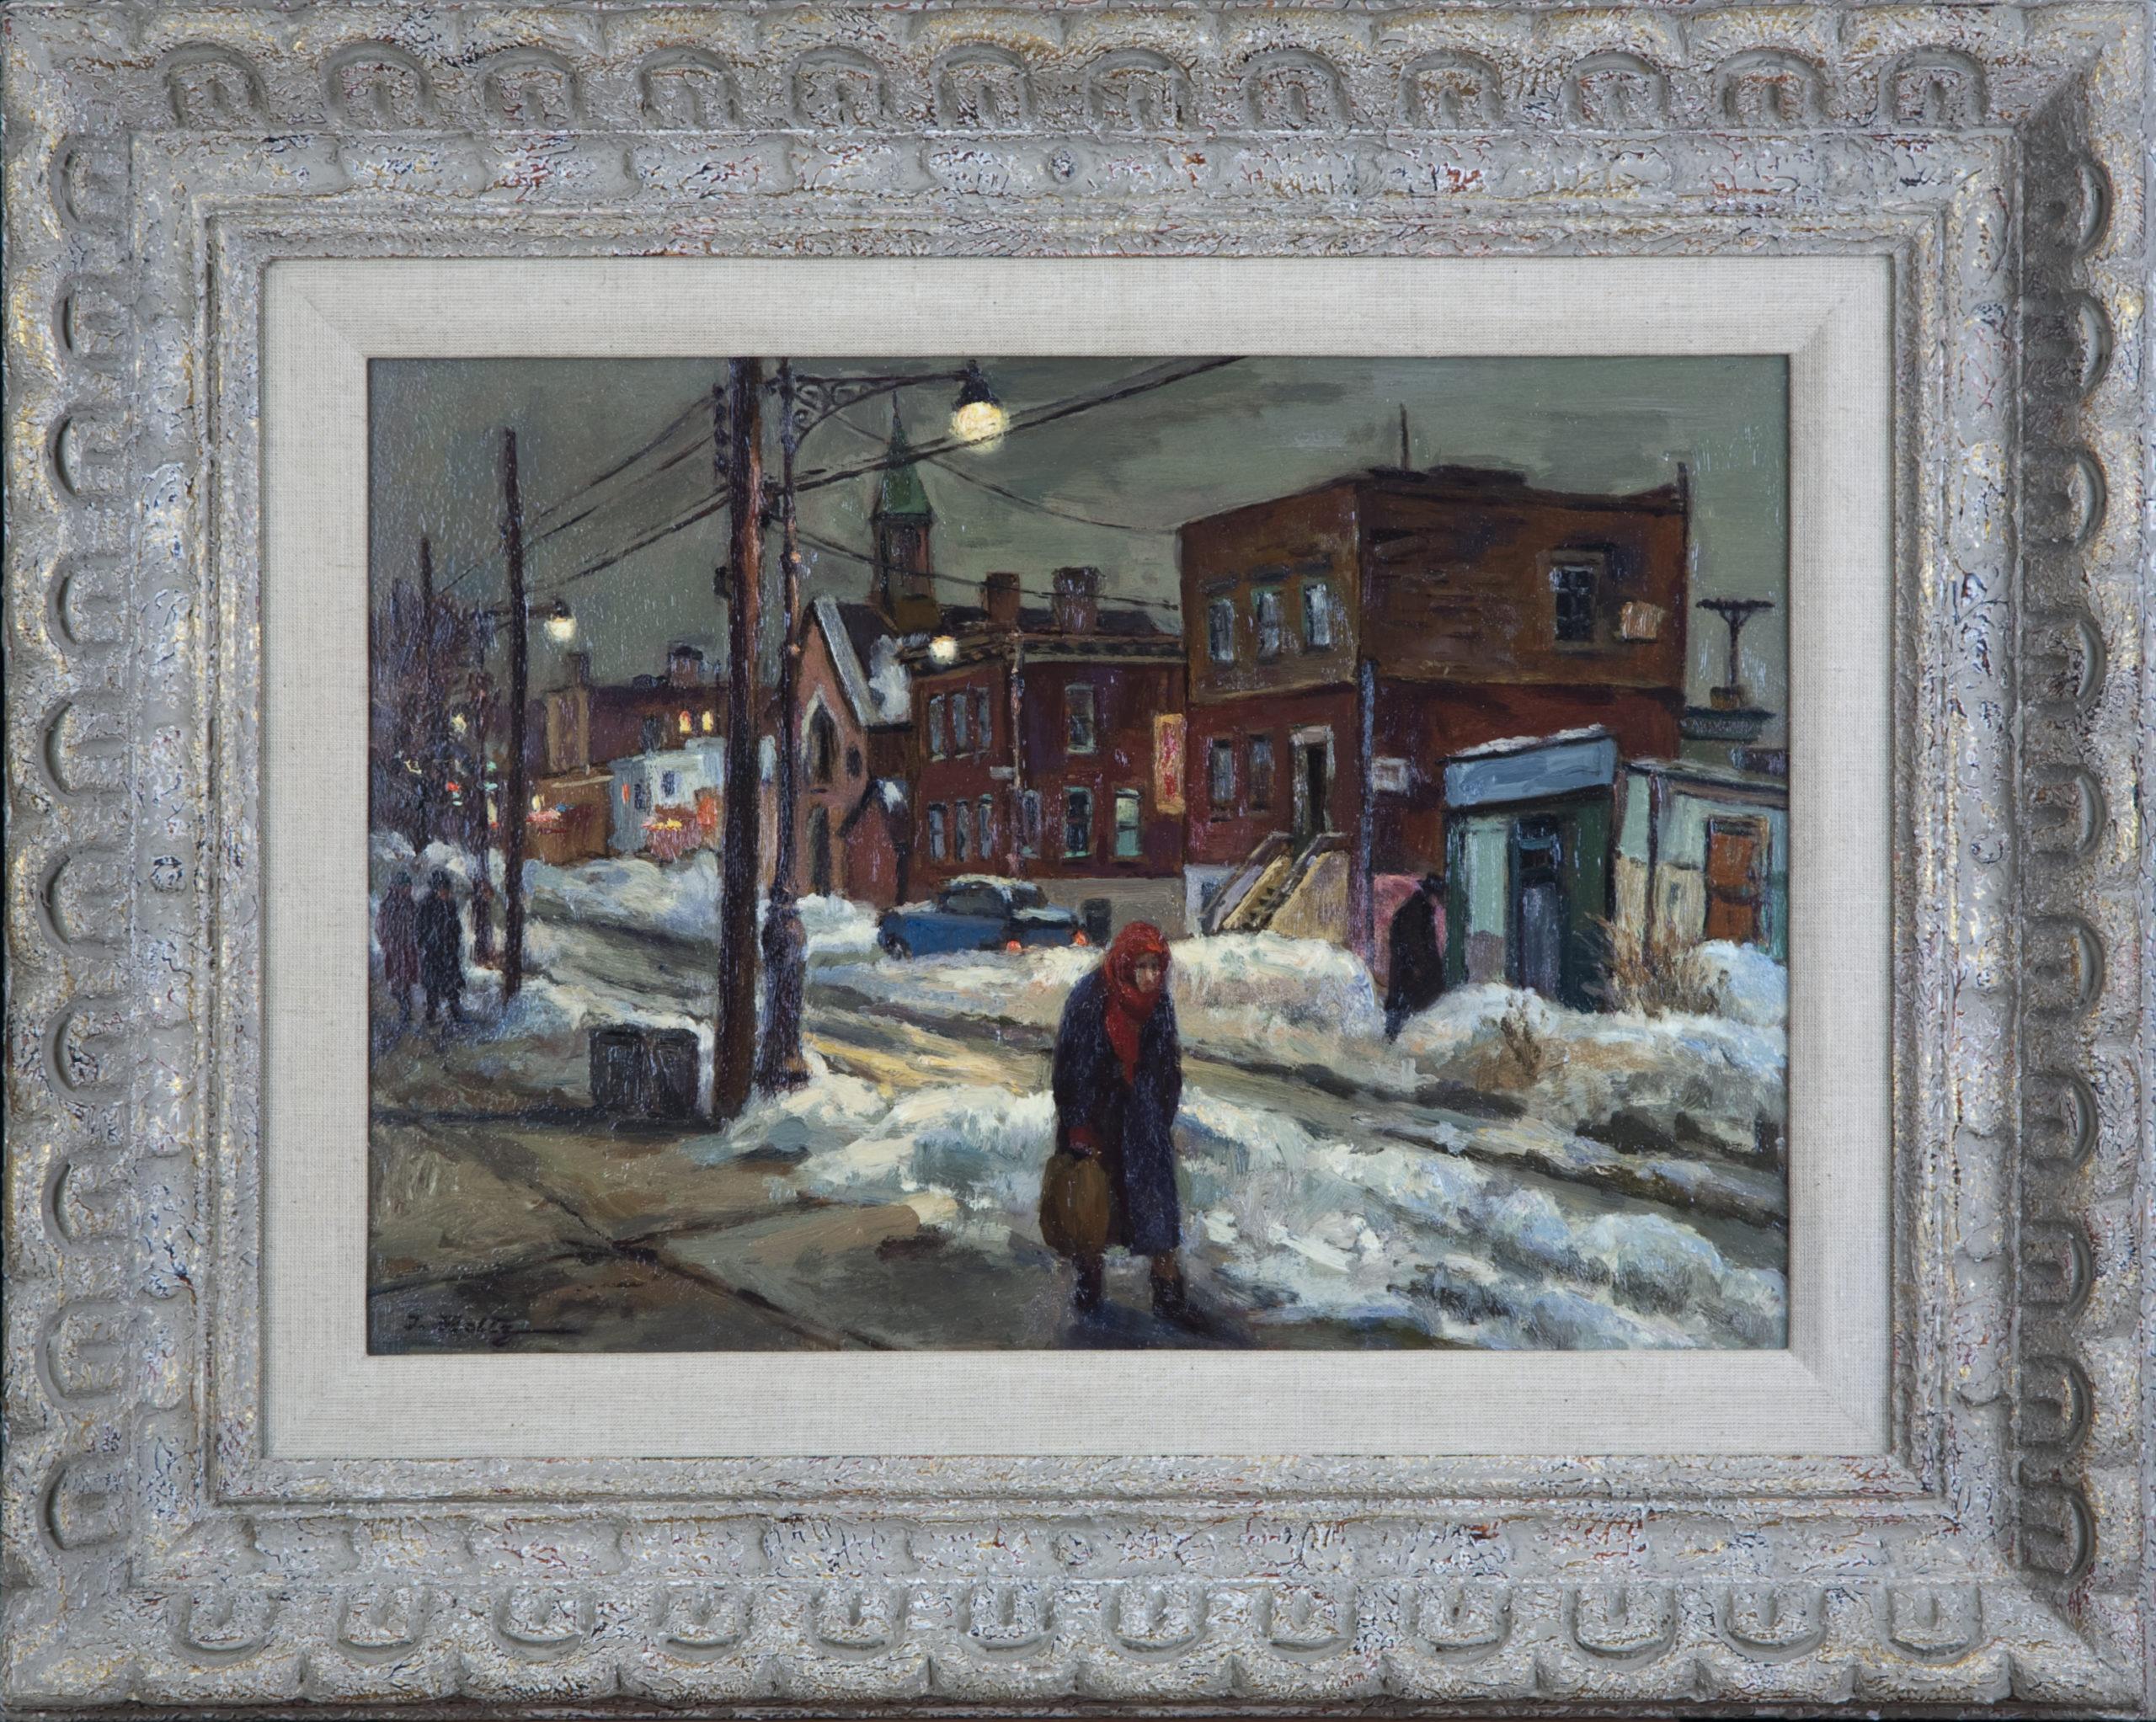 229 Snow Scene at Dusk NY 1964 - Oil on board - 18 x 13 - Frame: 23 x 18.25 x 2